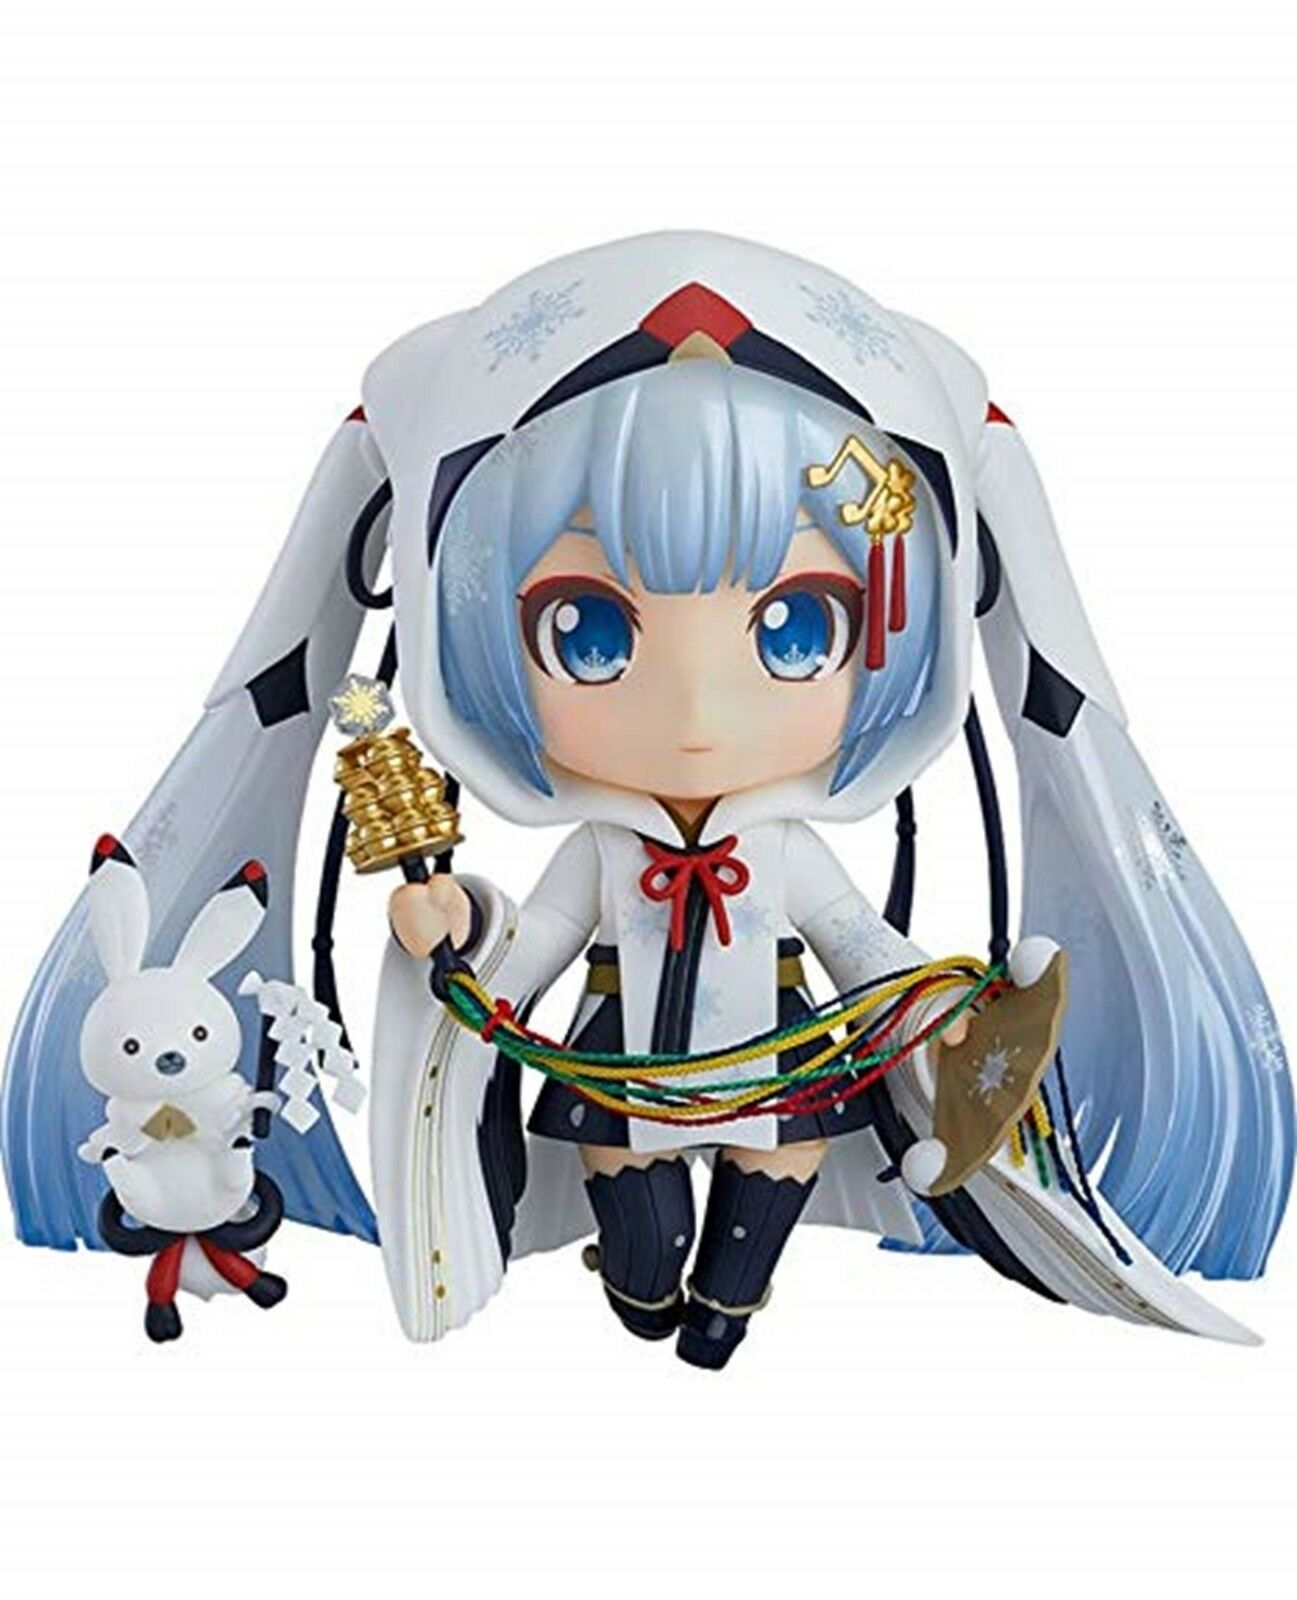 Nendoroid vocal series 01 hatsune miku snow miku crane maiden Ver JAPAN NEW